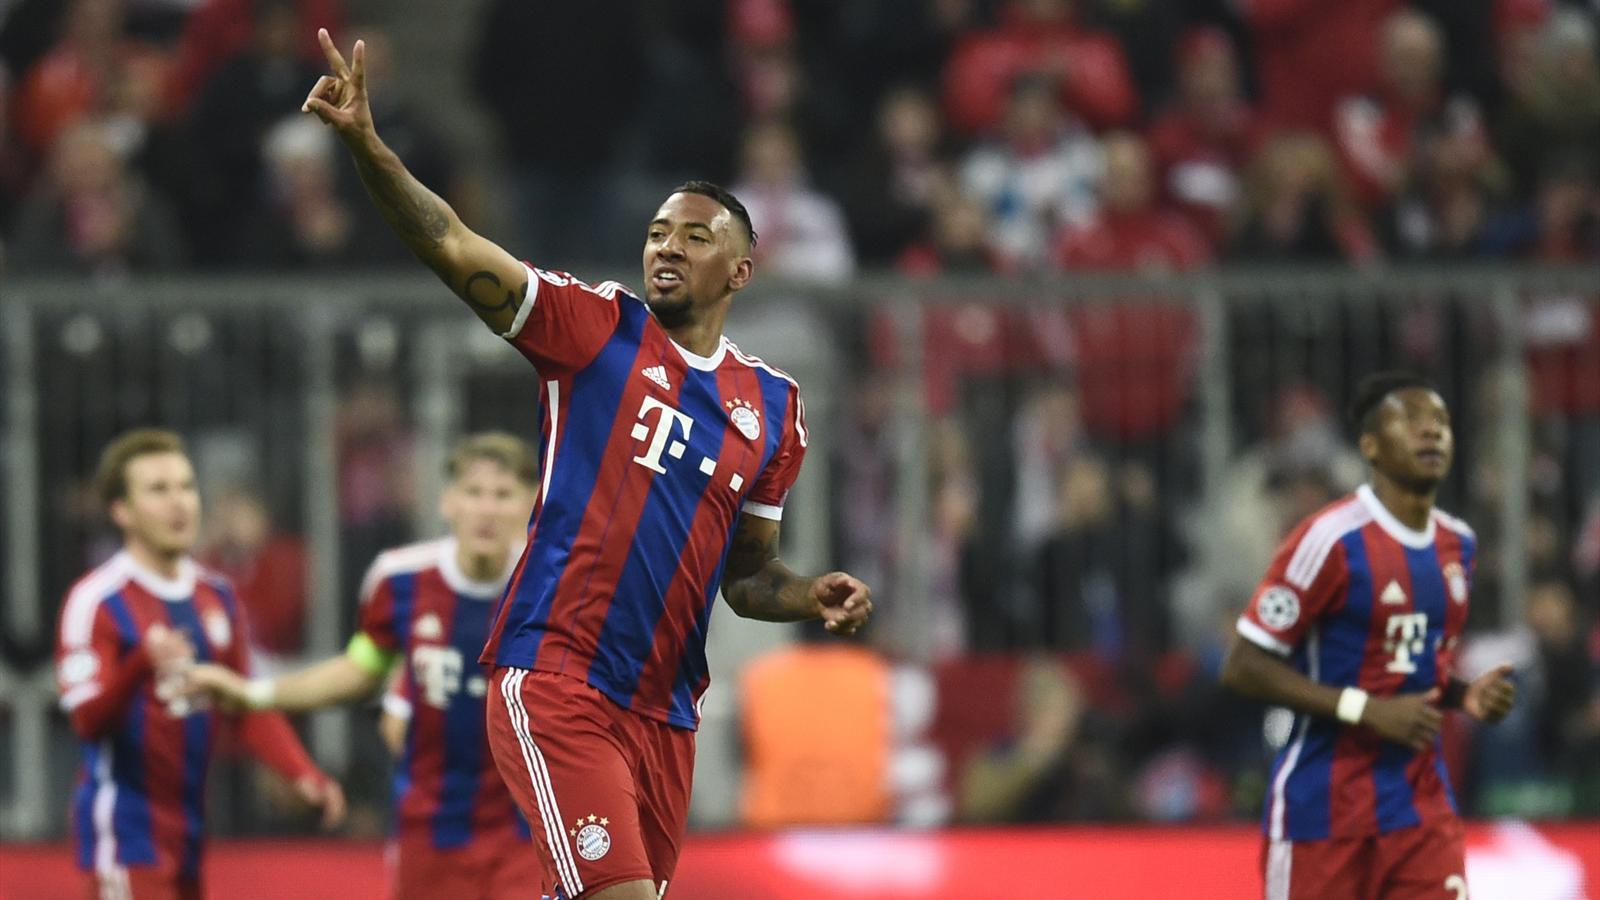 Bayern Munich's defender Jerome Boateng celebrates scoring the 2-0 goal during the UEFA Champions League second-leg, Round of 16 football match FC Bayern Munich vs Shakhtar Donetsk in Munich